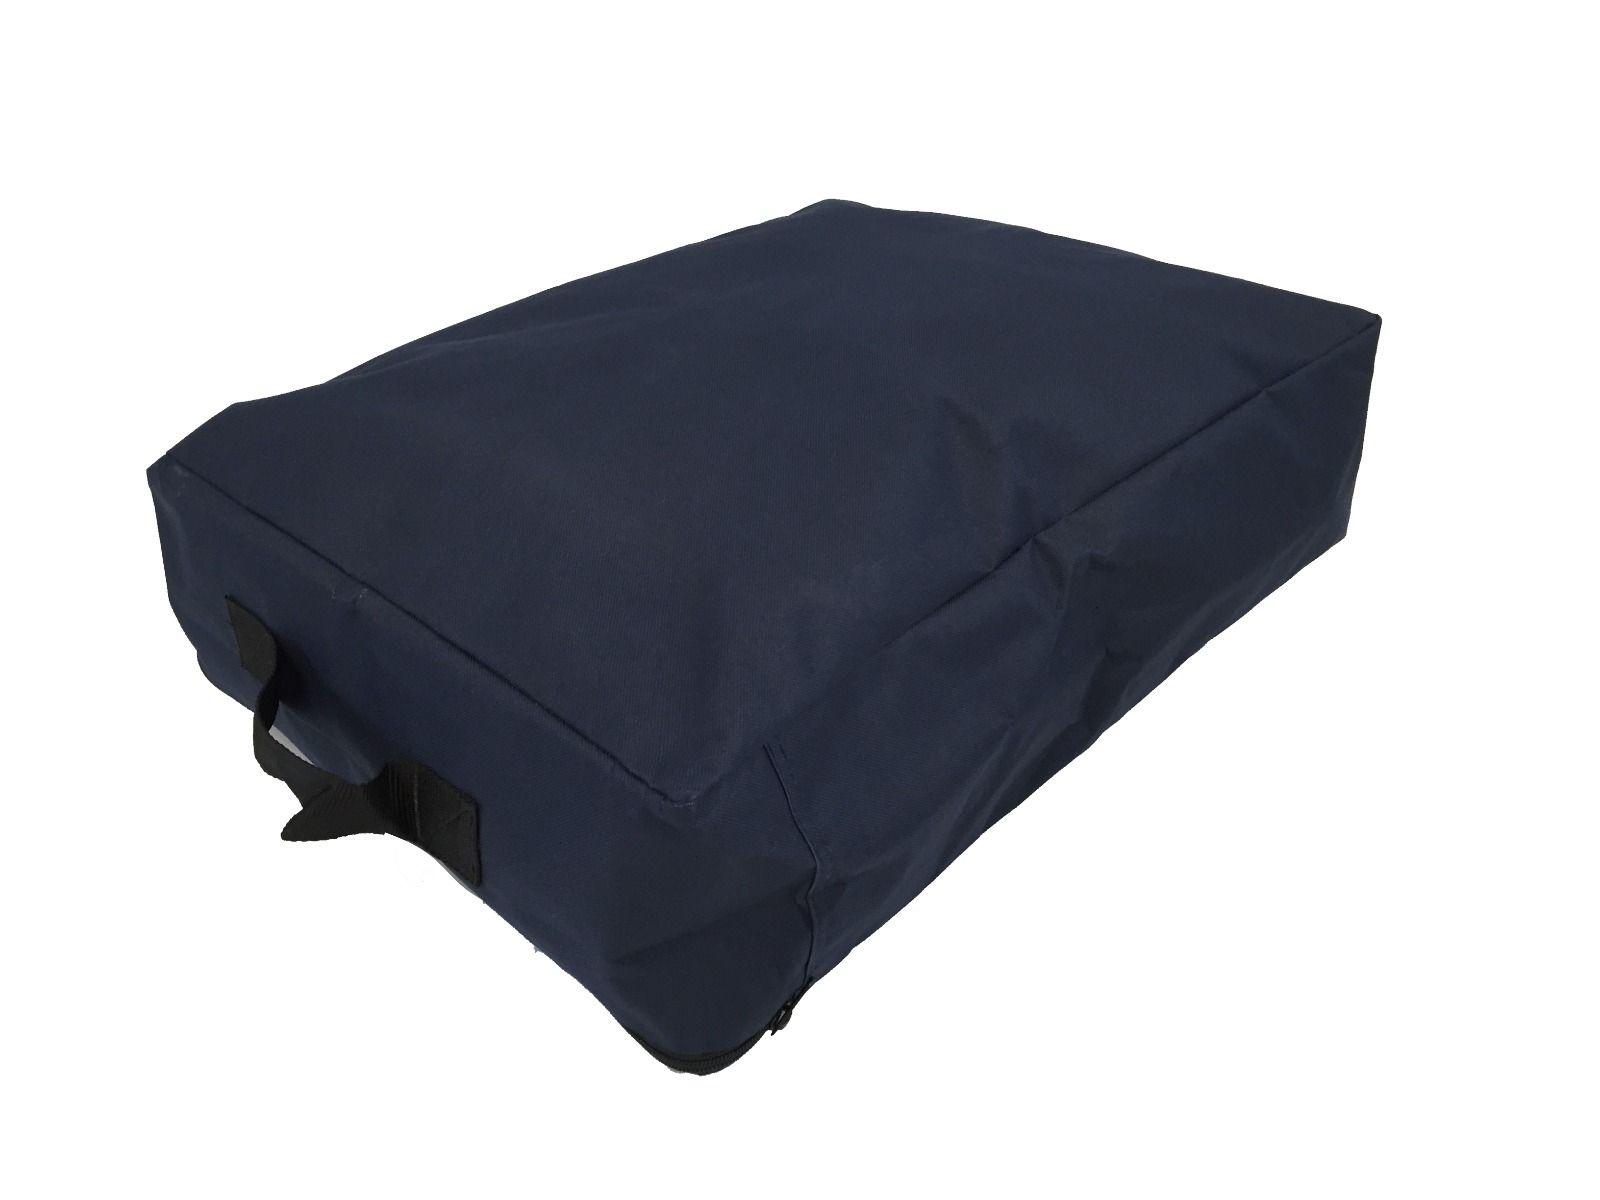 Blanket Storage Bag - Emergency Services